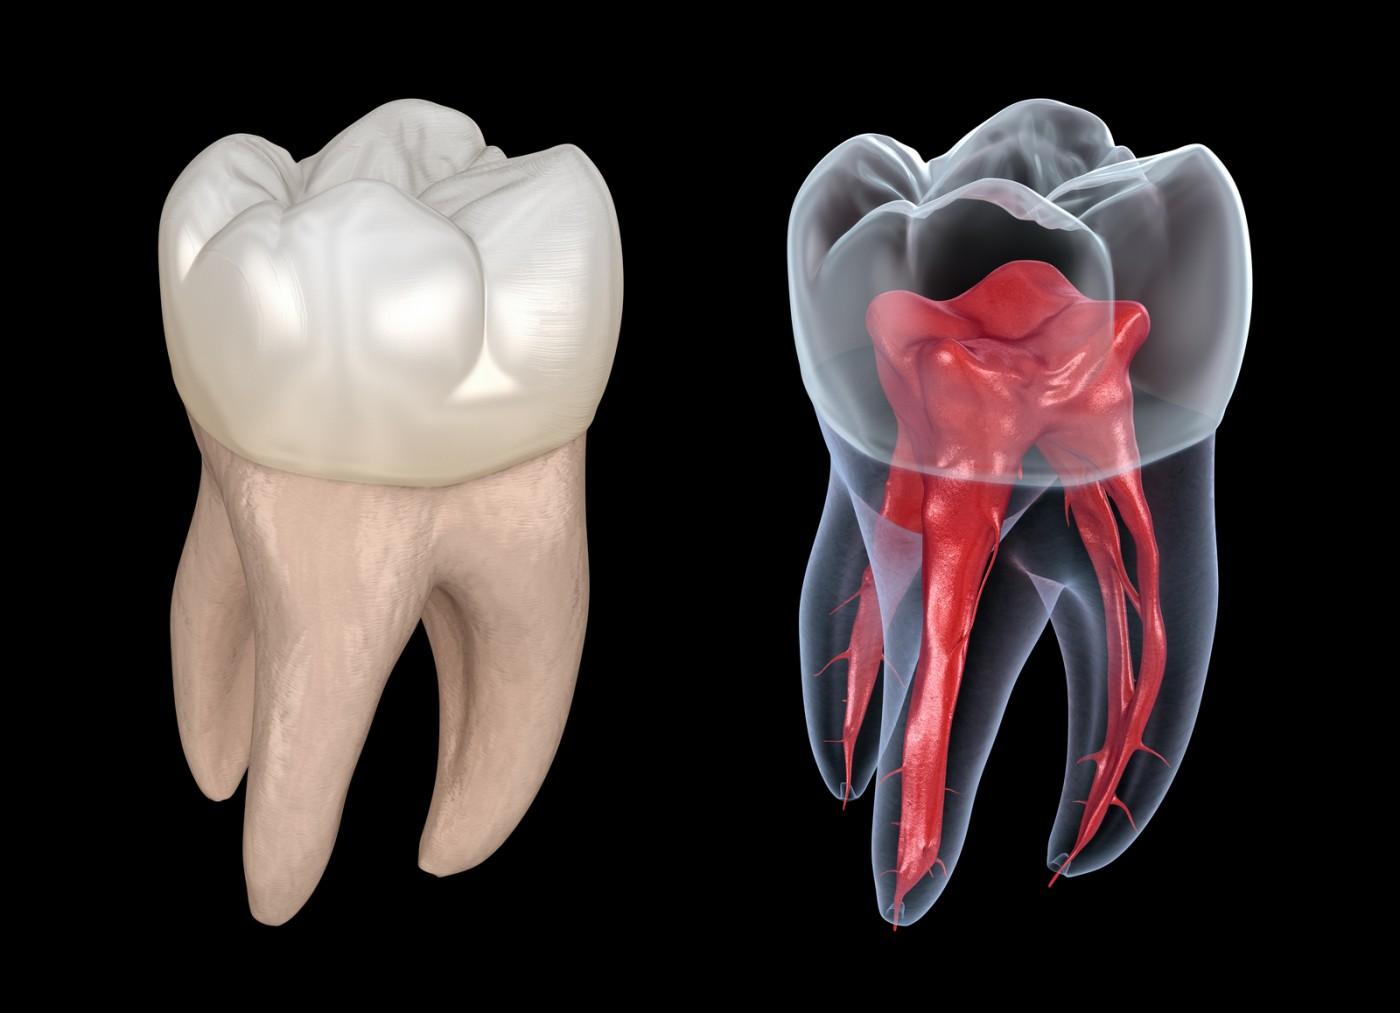 Când ai nevoie de tratament endodontic?